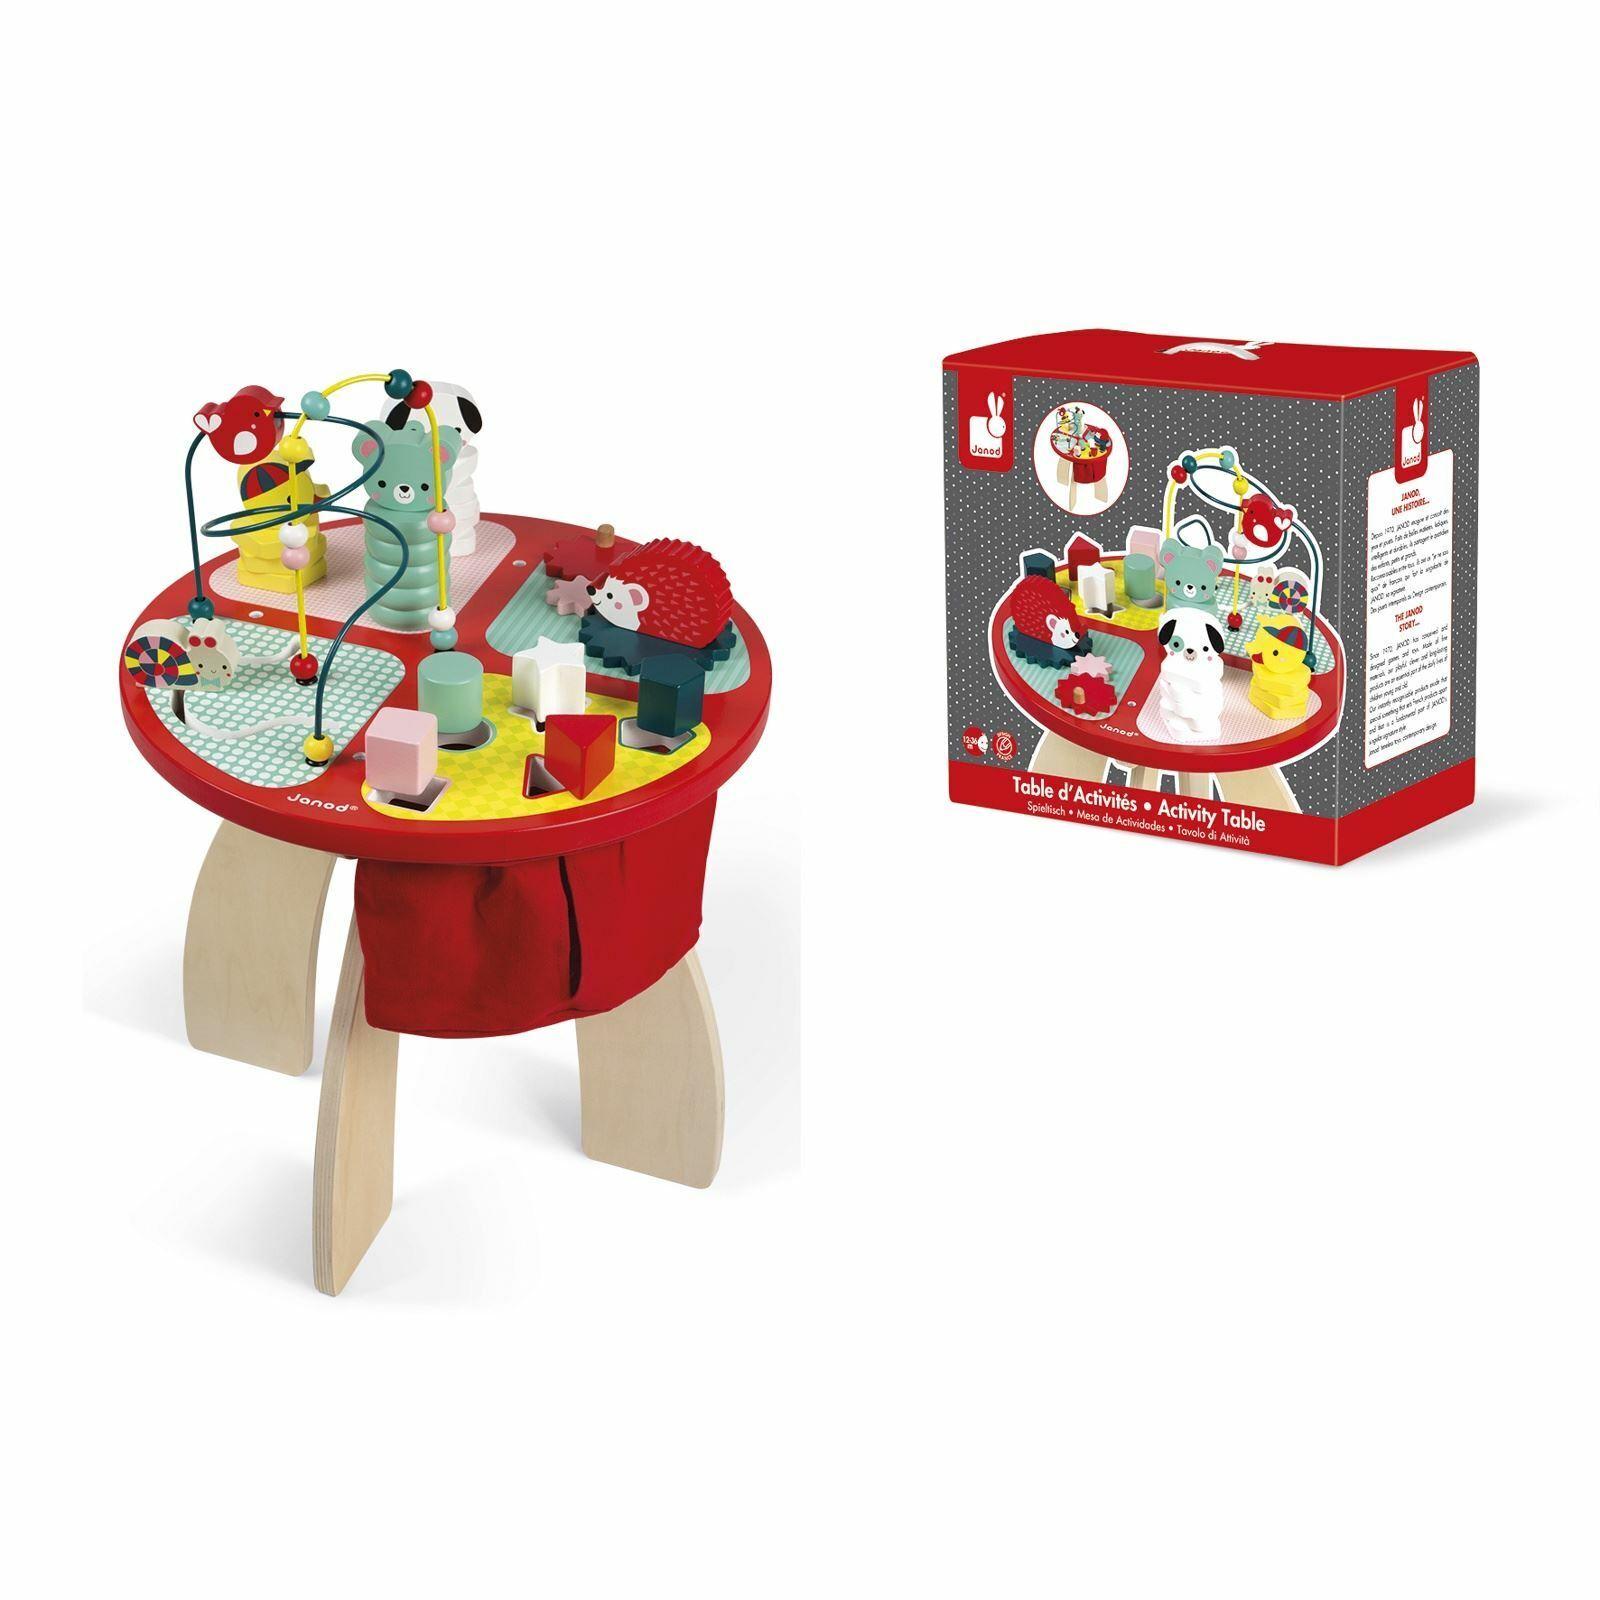 Janod bebis Forest träen Activity Play Table bebis Kiddler Pre skola